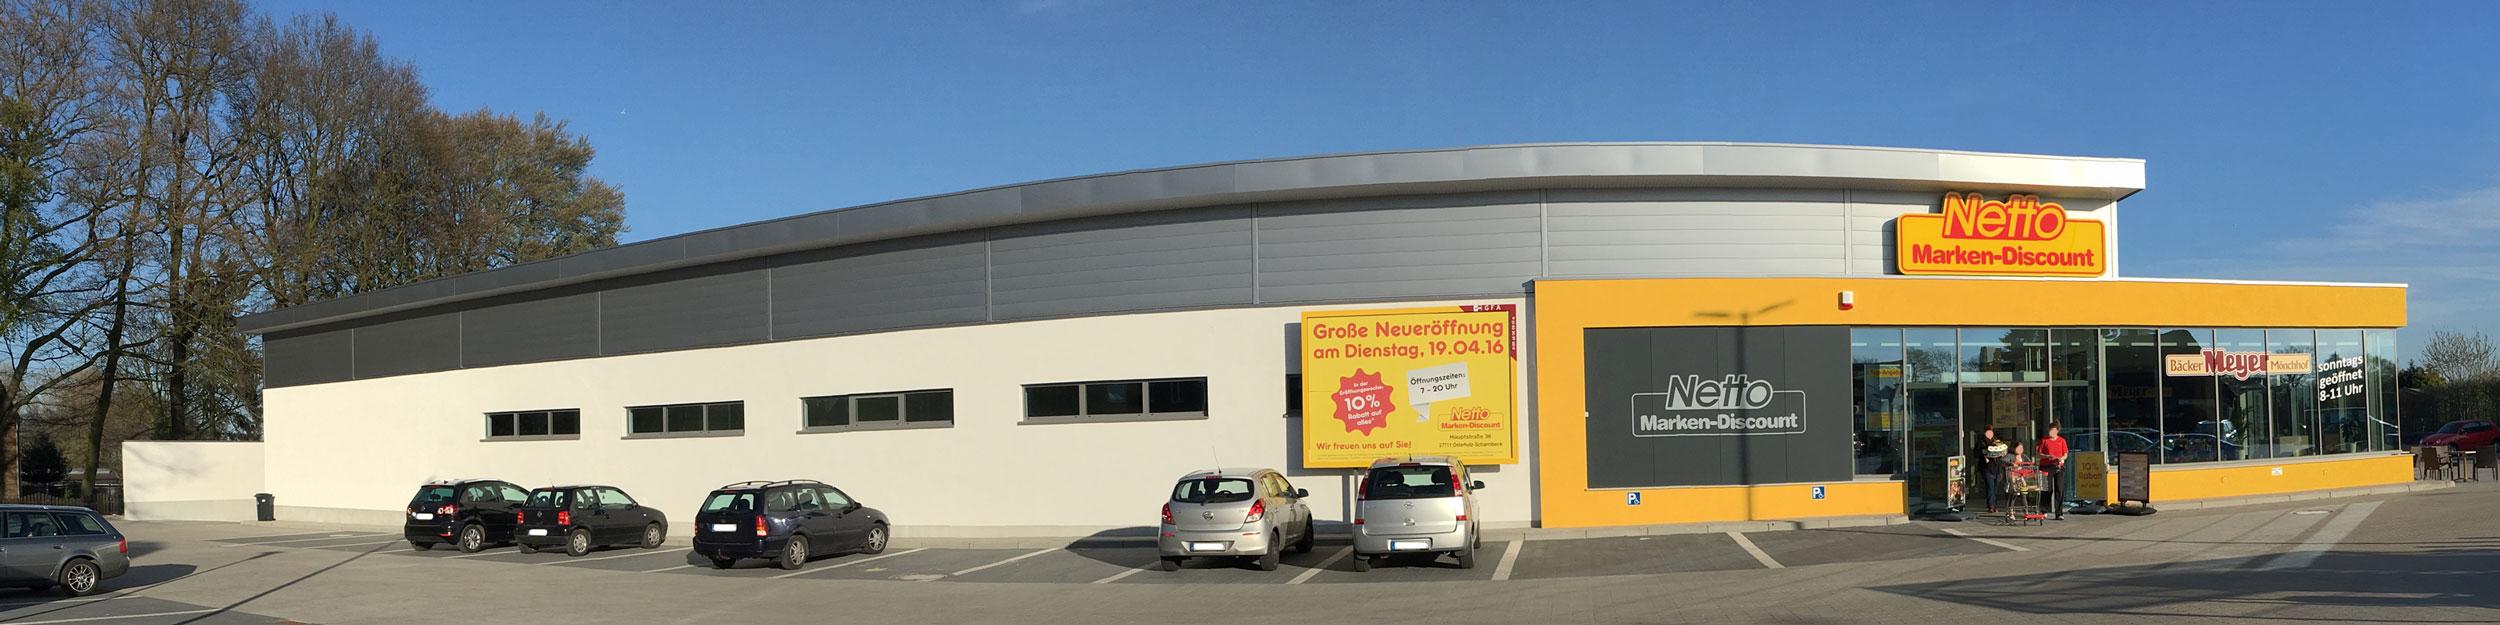 Netto-Supermarkt-Helmut-Kueck